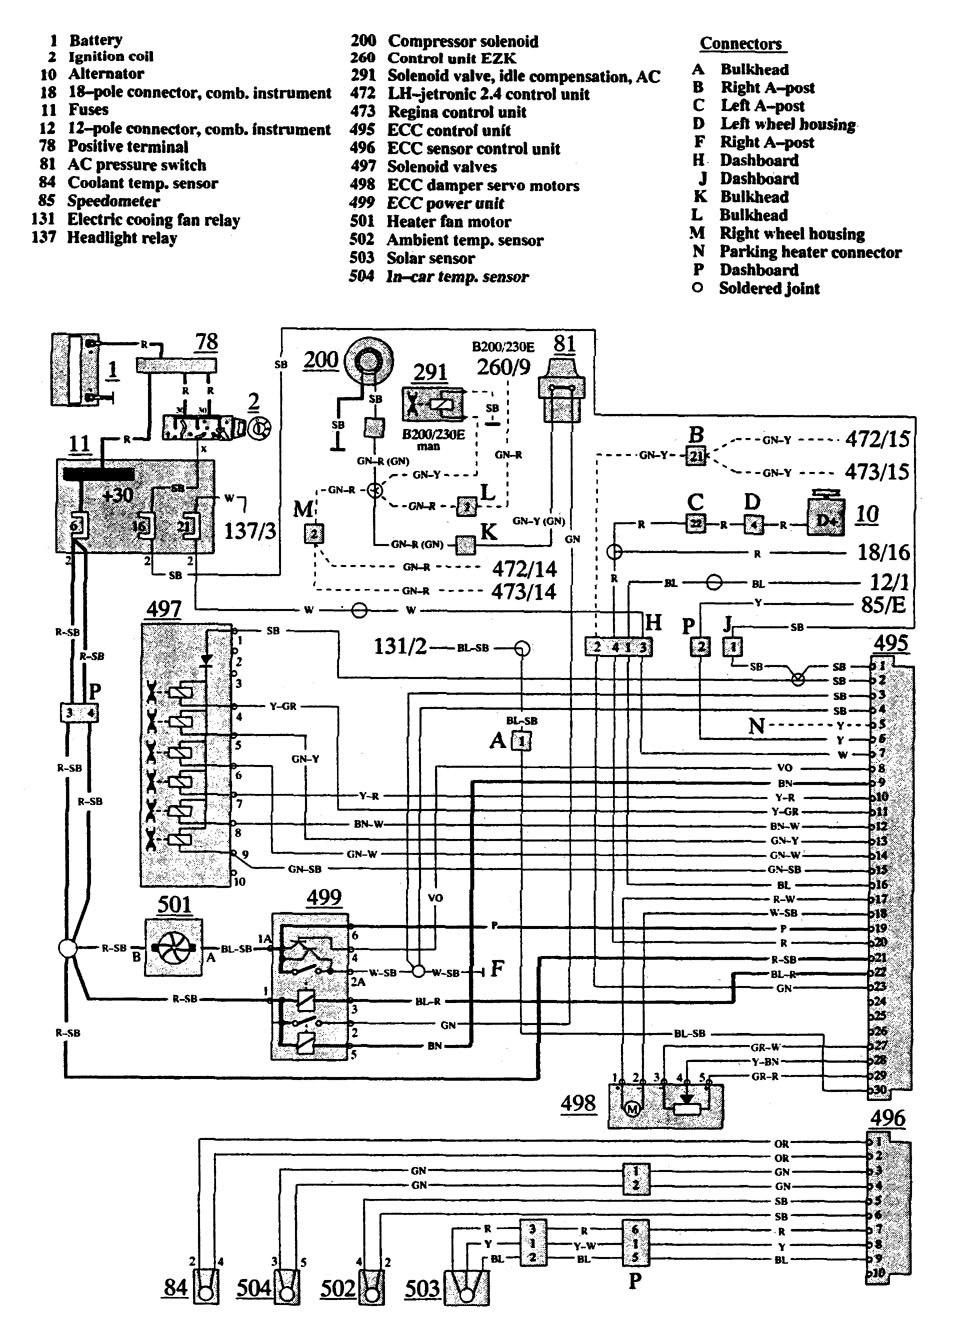 1992 volvo 240 ac wiring - data diagram schematic on ford festiva ignition  wiring diagram, subaru justy